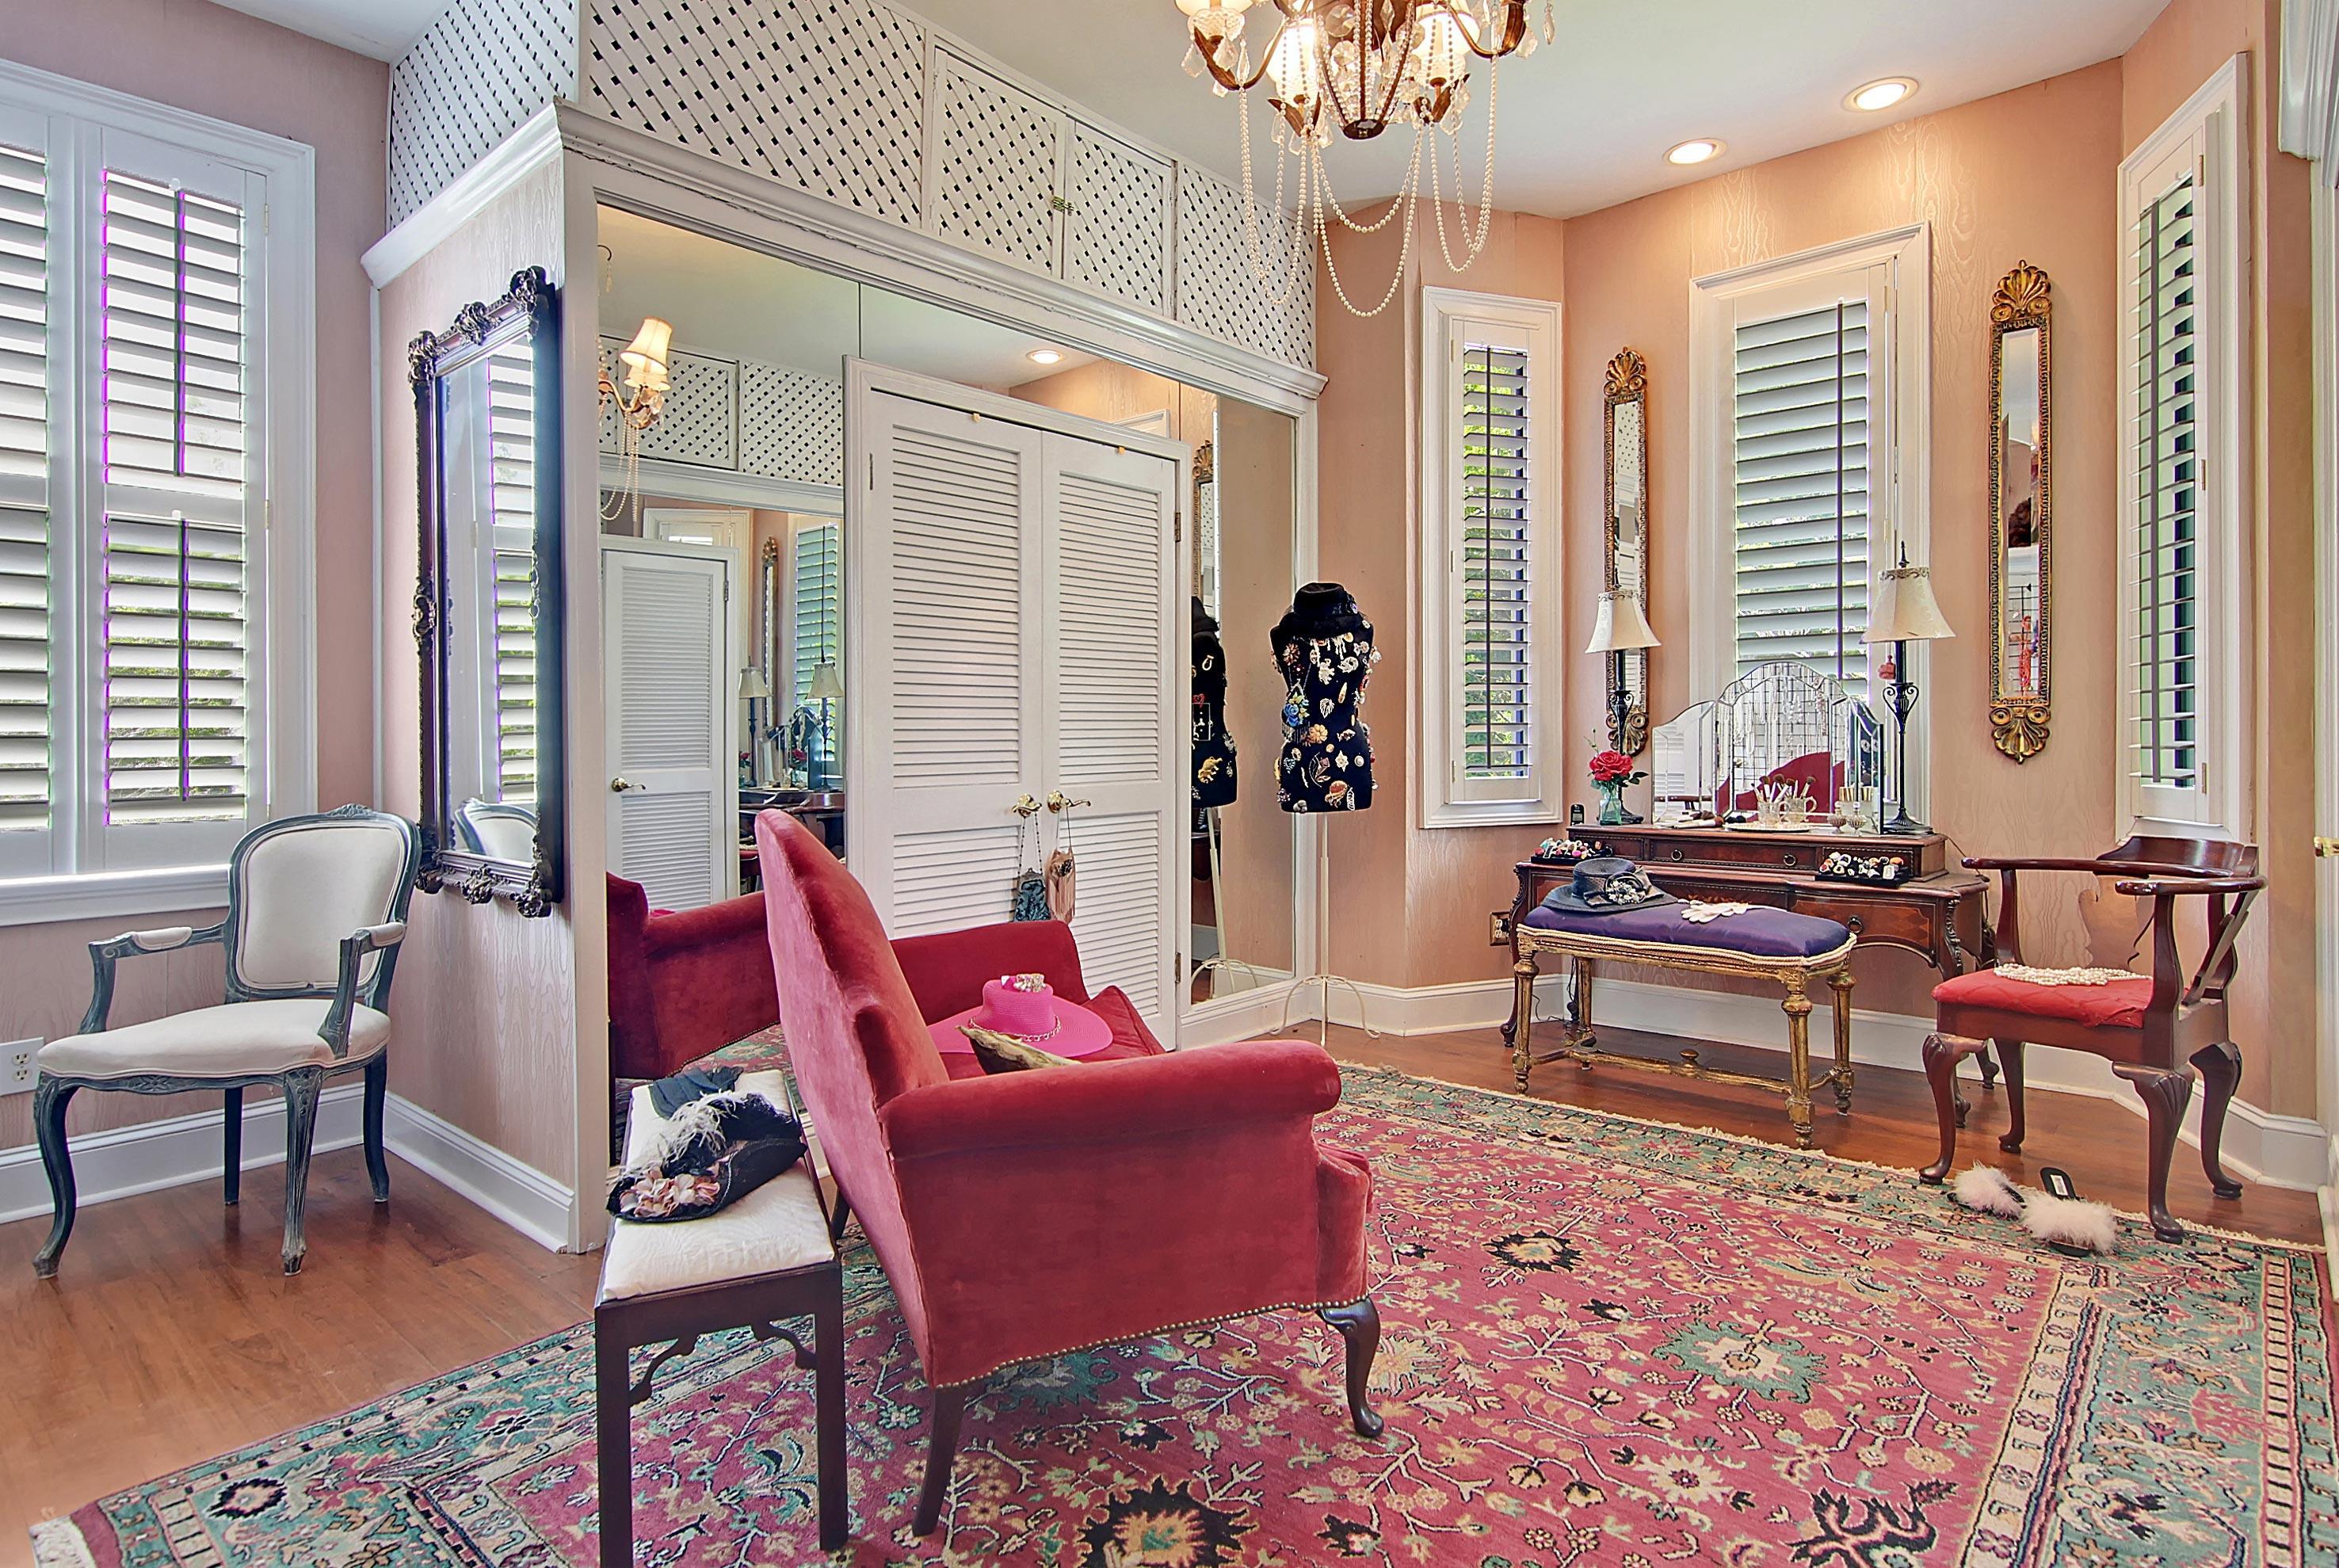 Edgewater Park Homes For Sale - 1323 Edgewater, Charleston, SC - 46